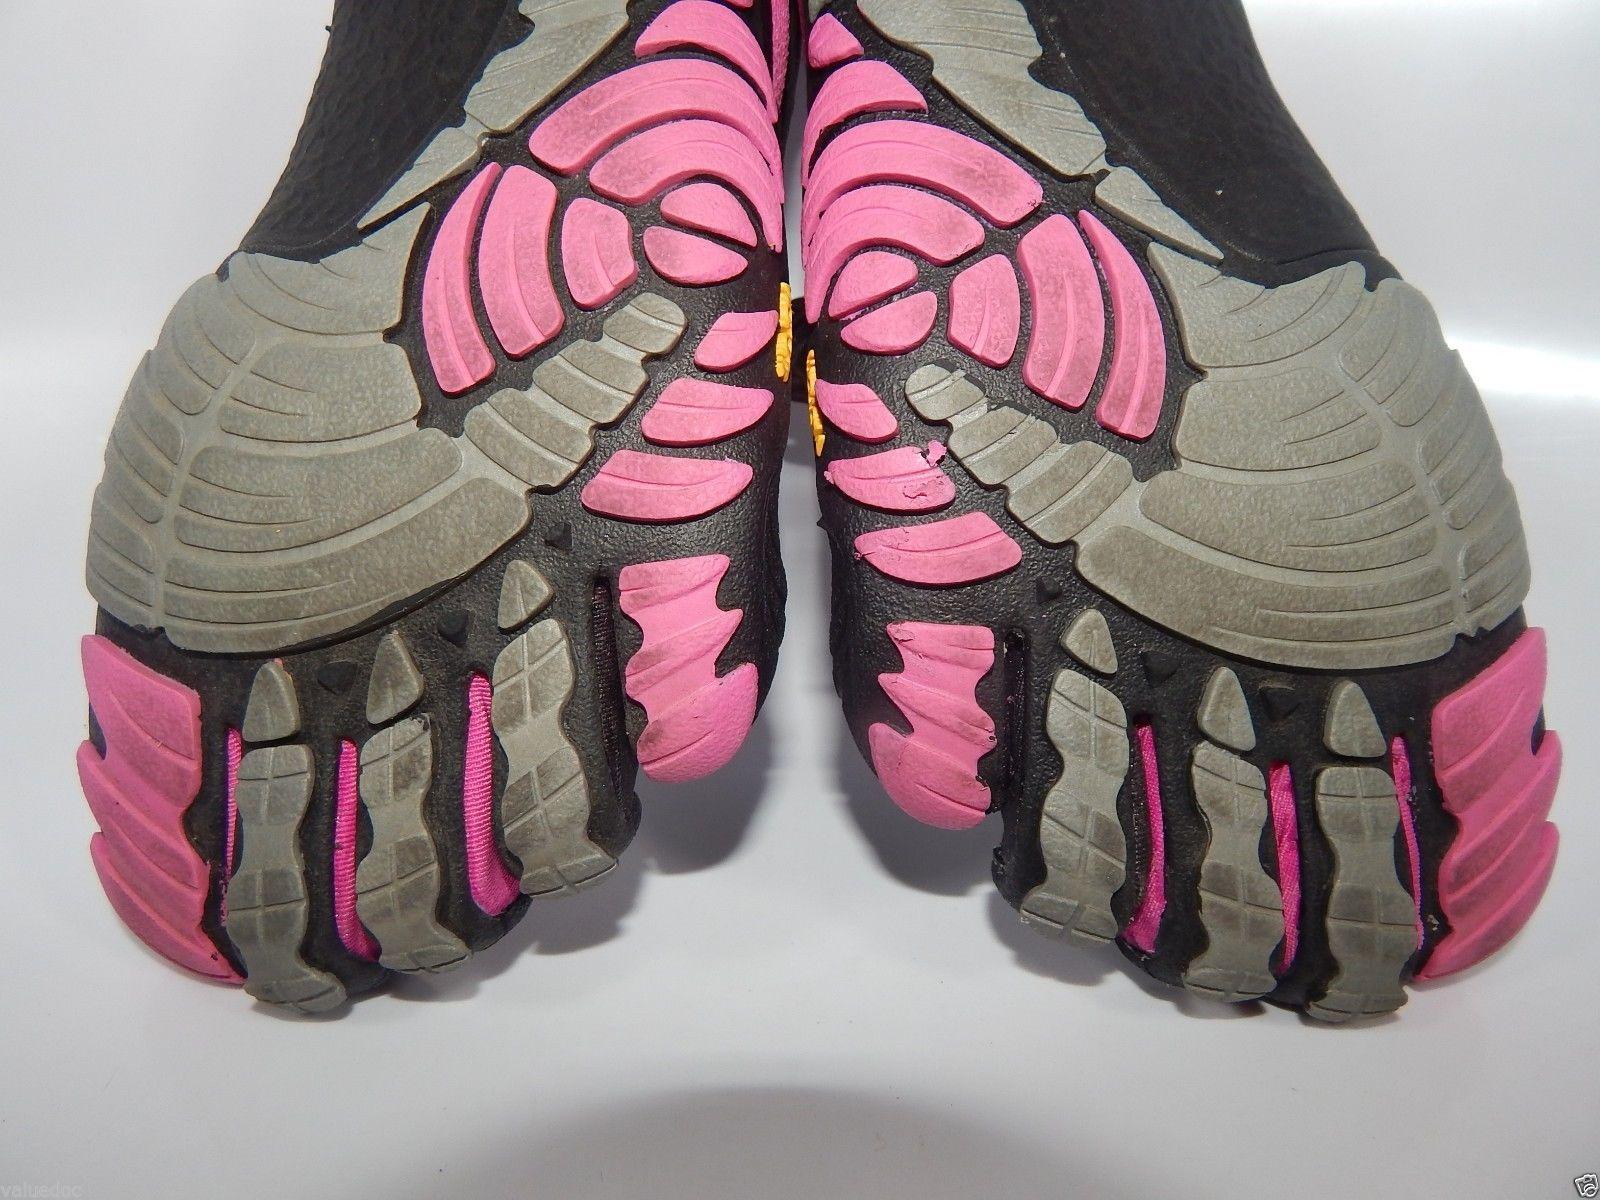 Vibram KMD Sport LS Womens Running Shoes 6 M ( B ) EU 14w3603